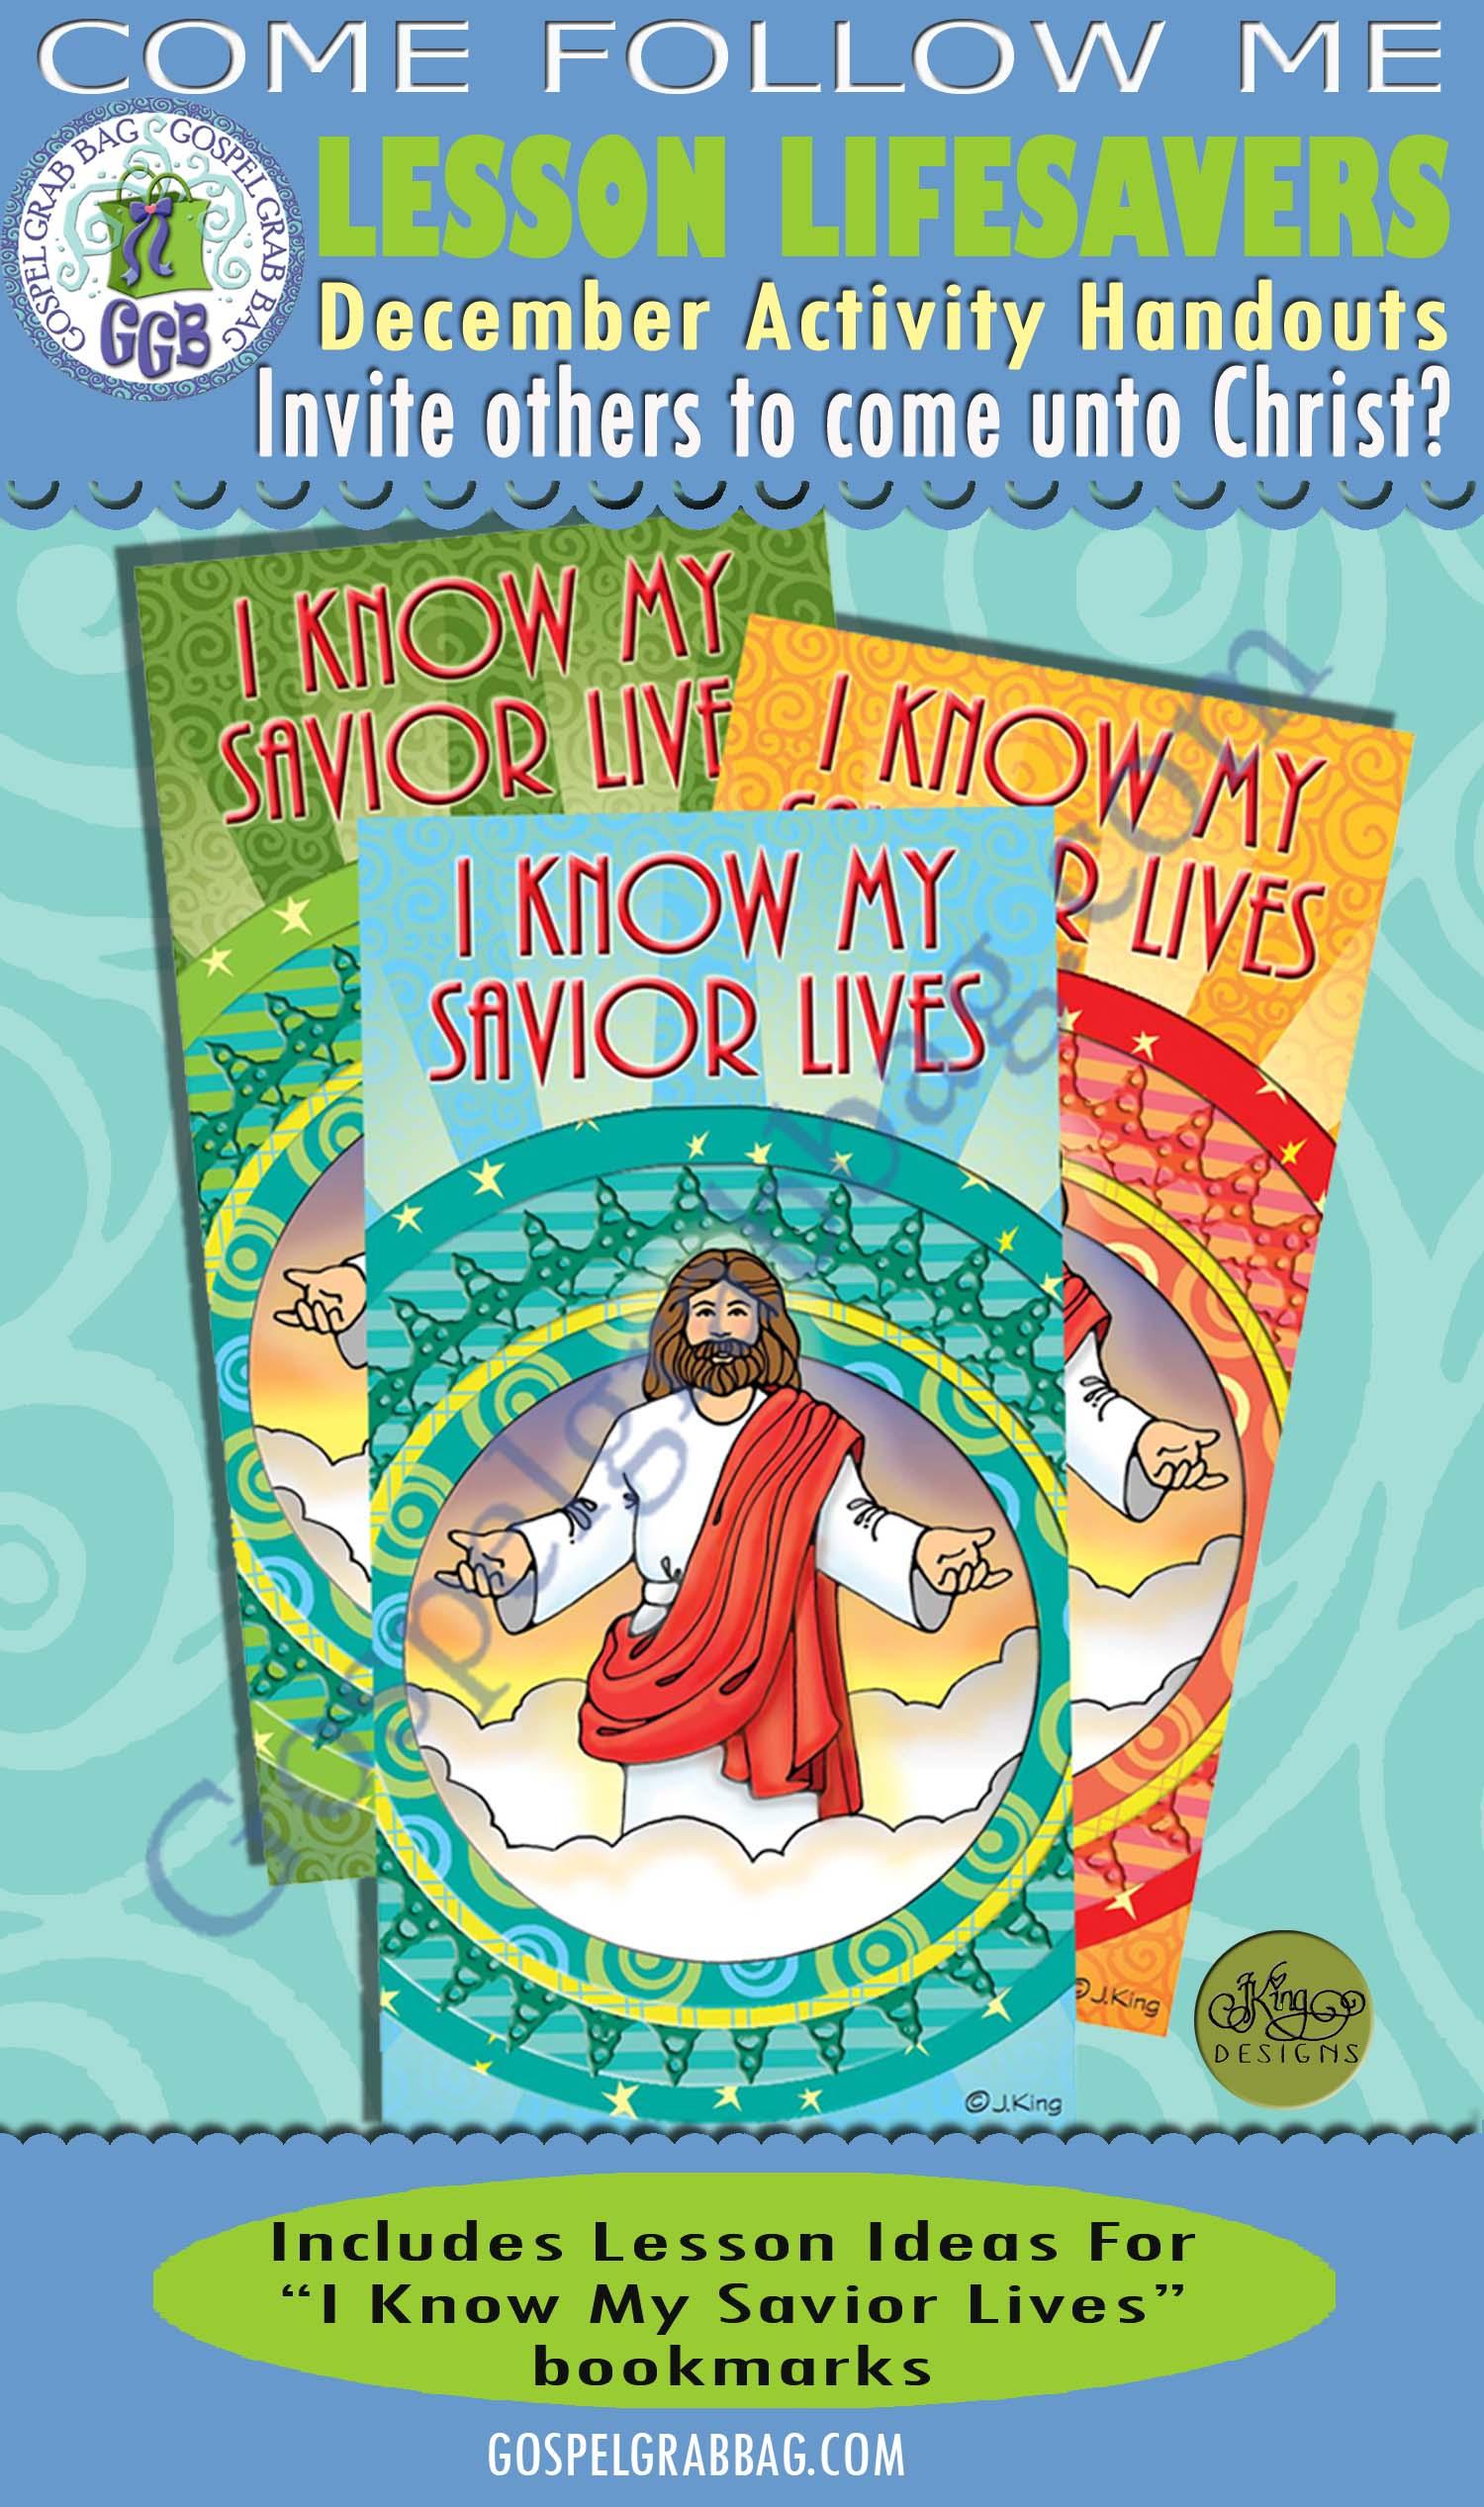 "$1.75 December Lesson 1 - Come Follow Me ""How can I invite others to come unto Christ?"" ACTIVITY: I Know My Savior Lives bookmarks, GospelGrabBag.com"